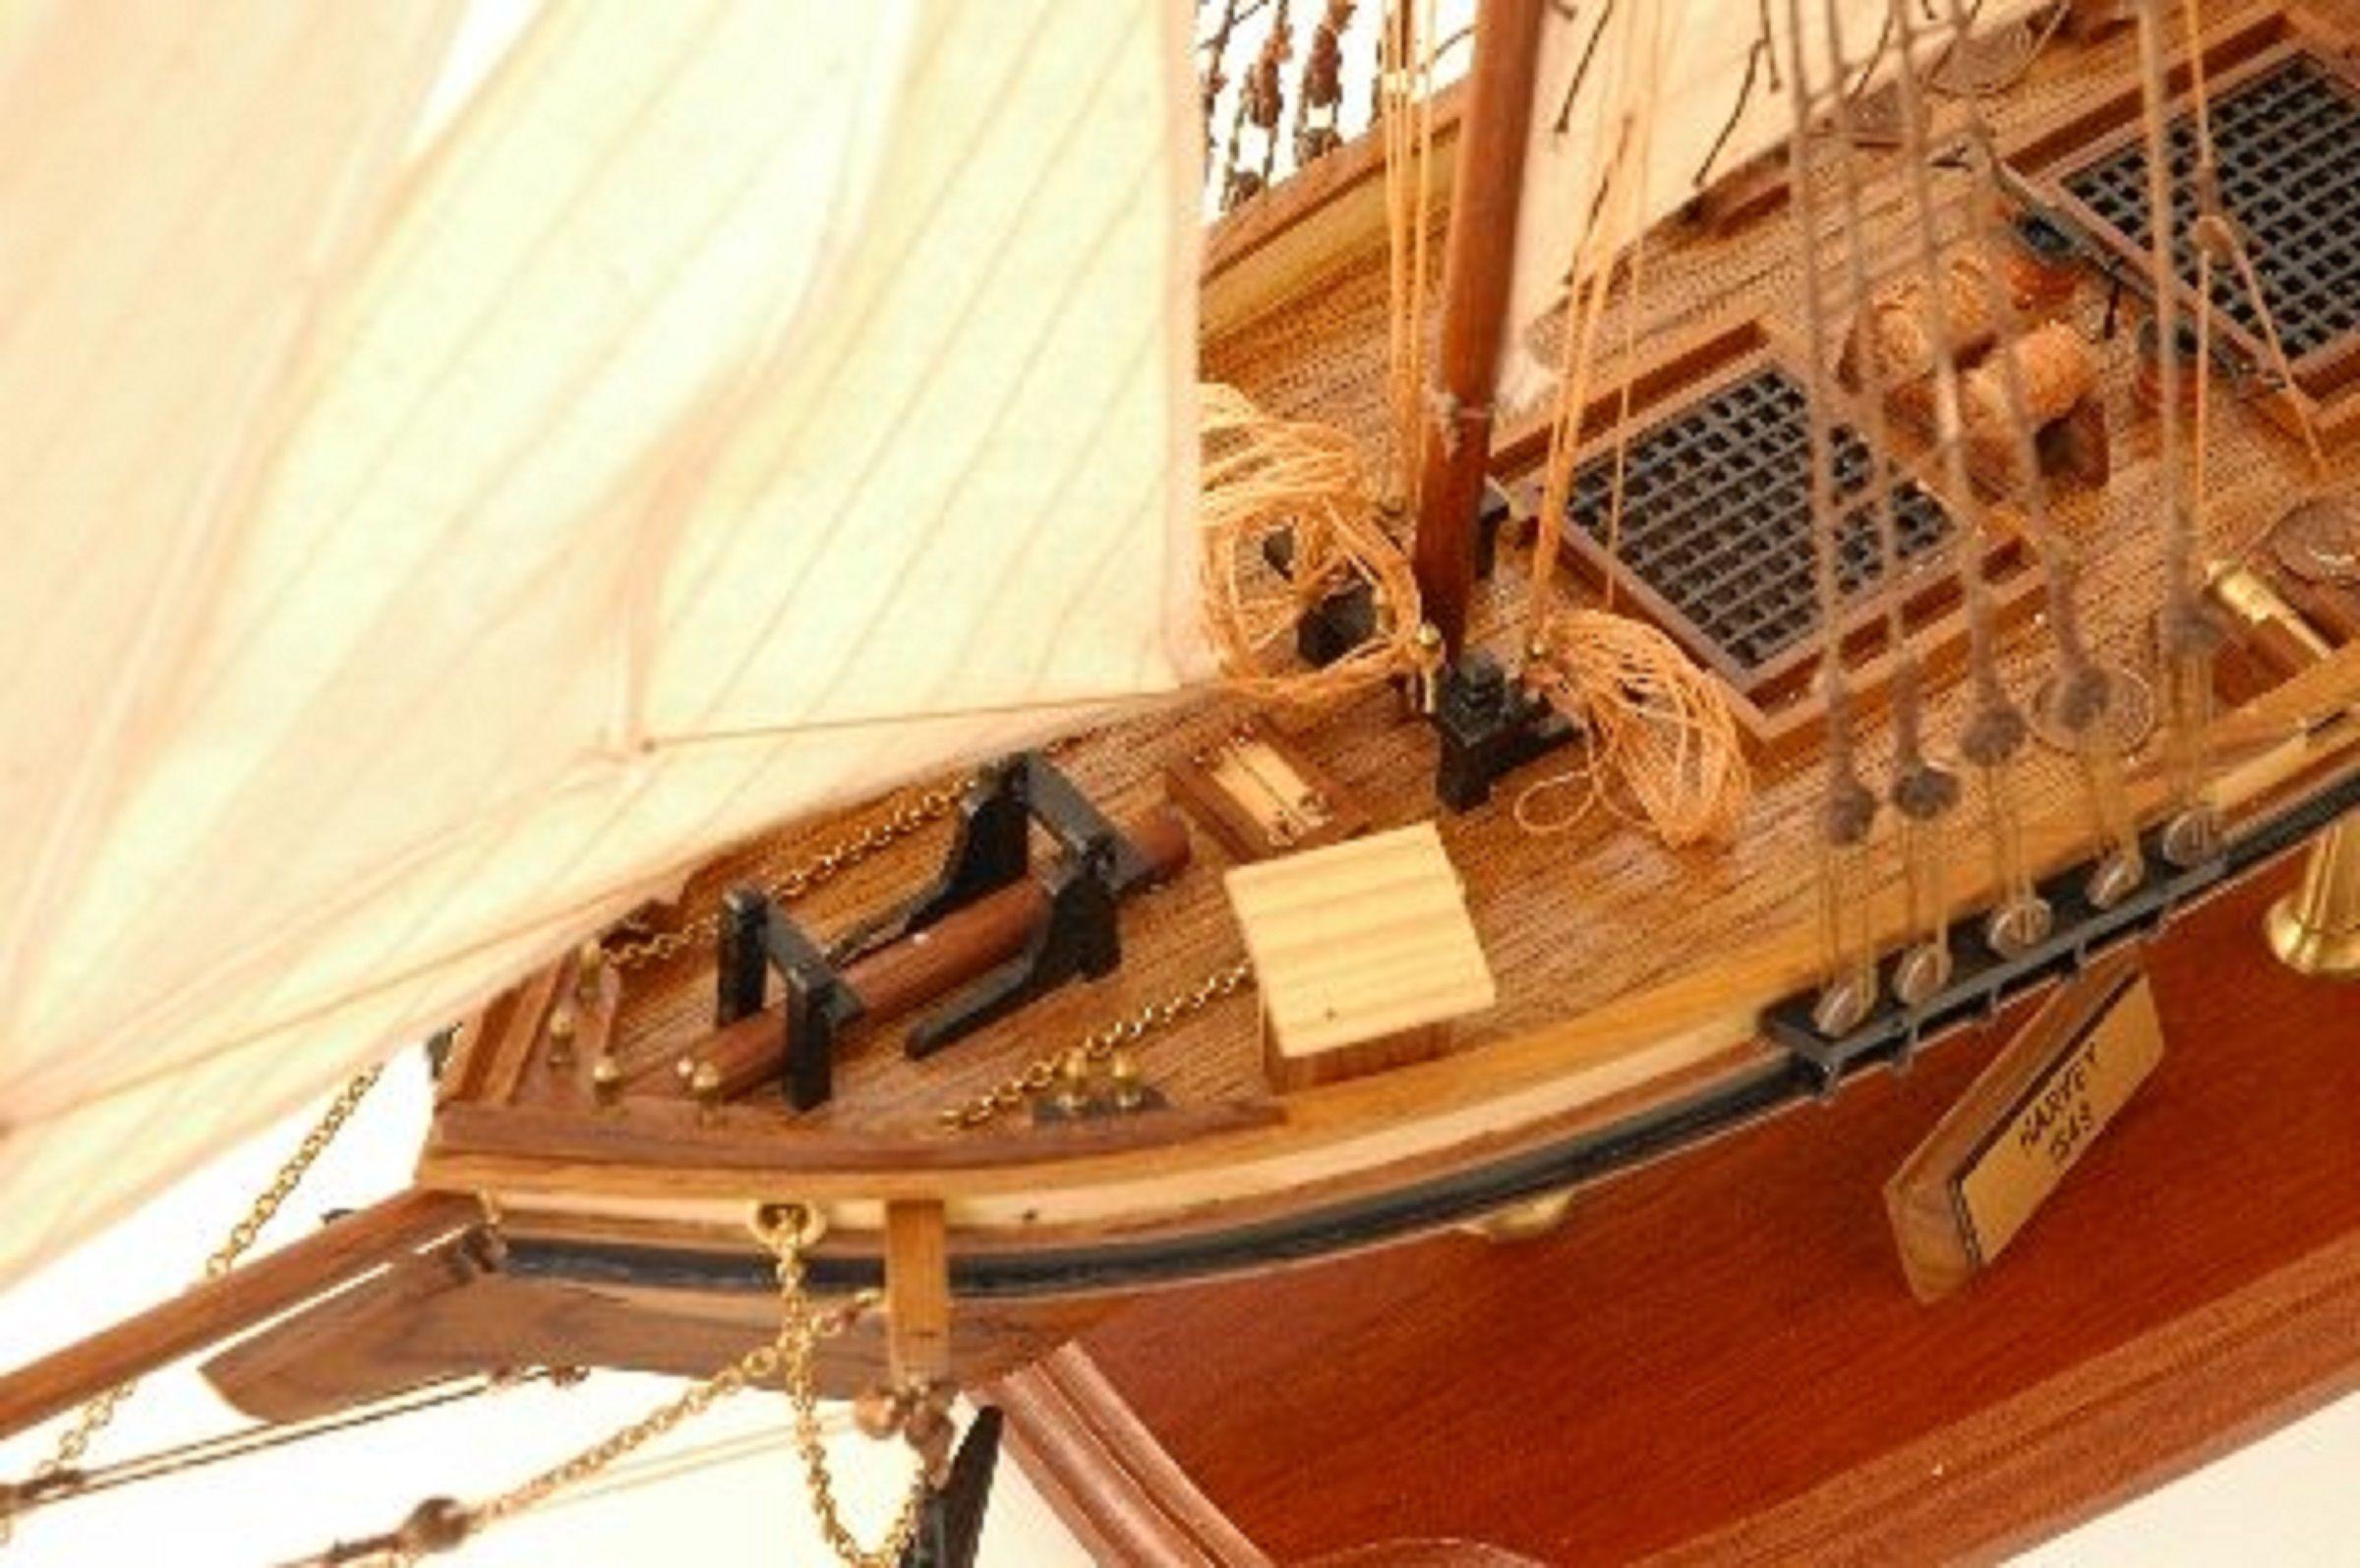 514-8309-Harvey-Model-Boat-Superior-Range